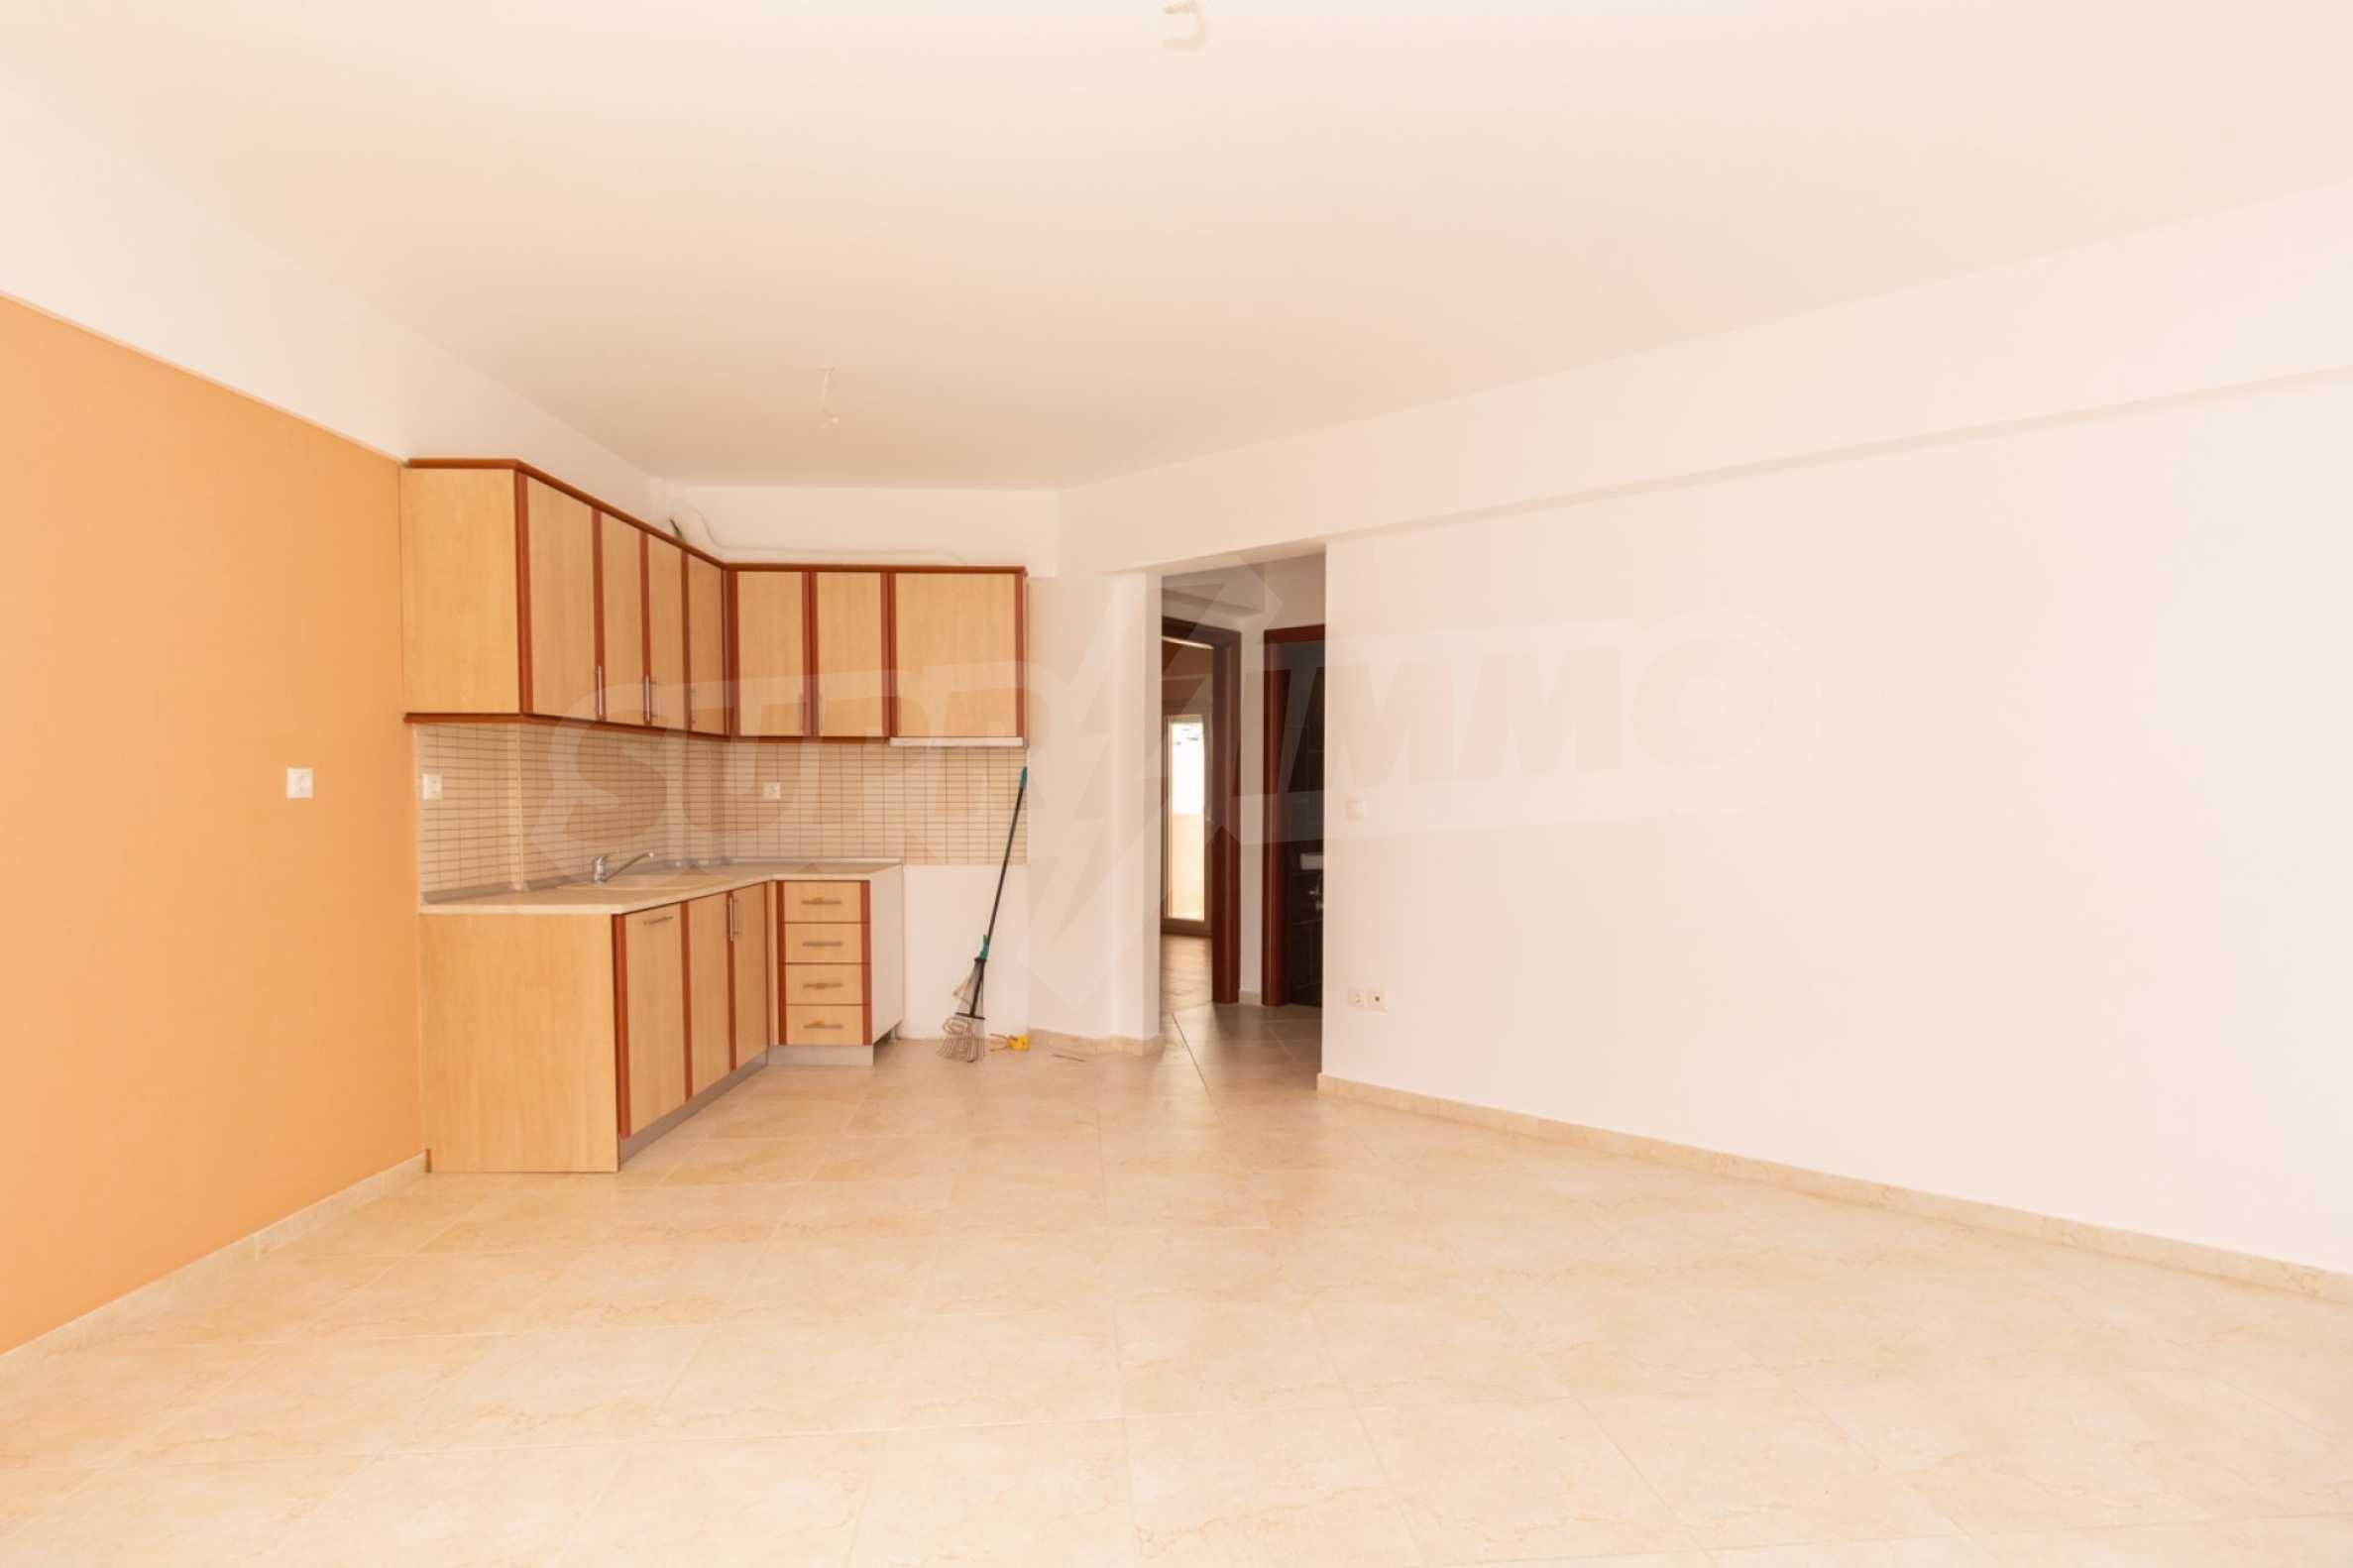 тристаен апартамент в Потидея, Касандра 22